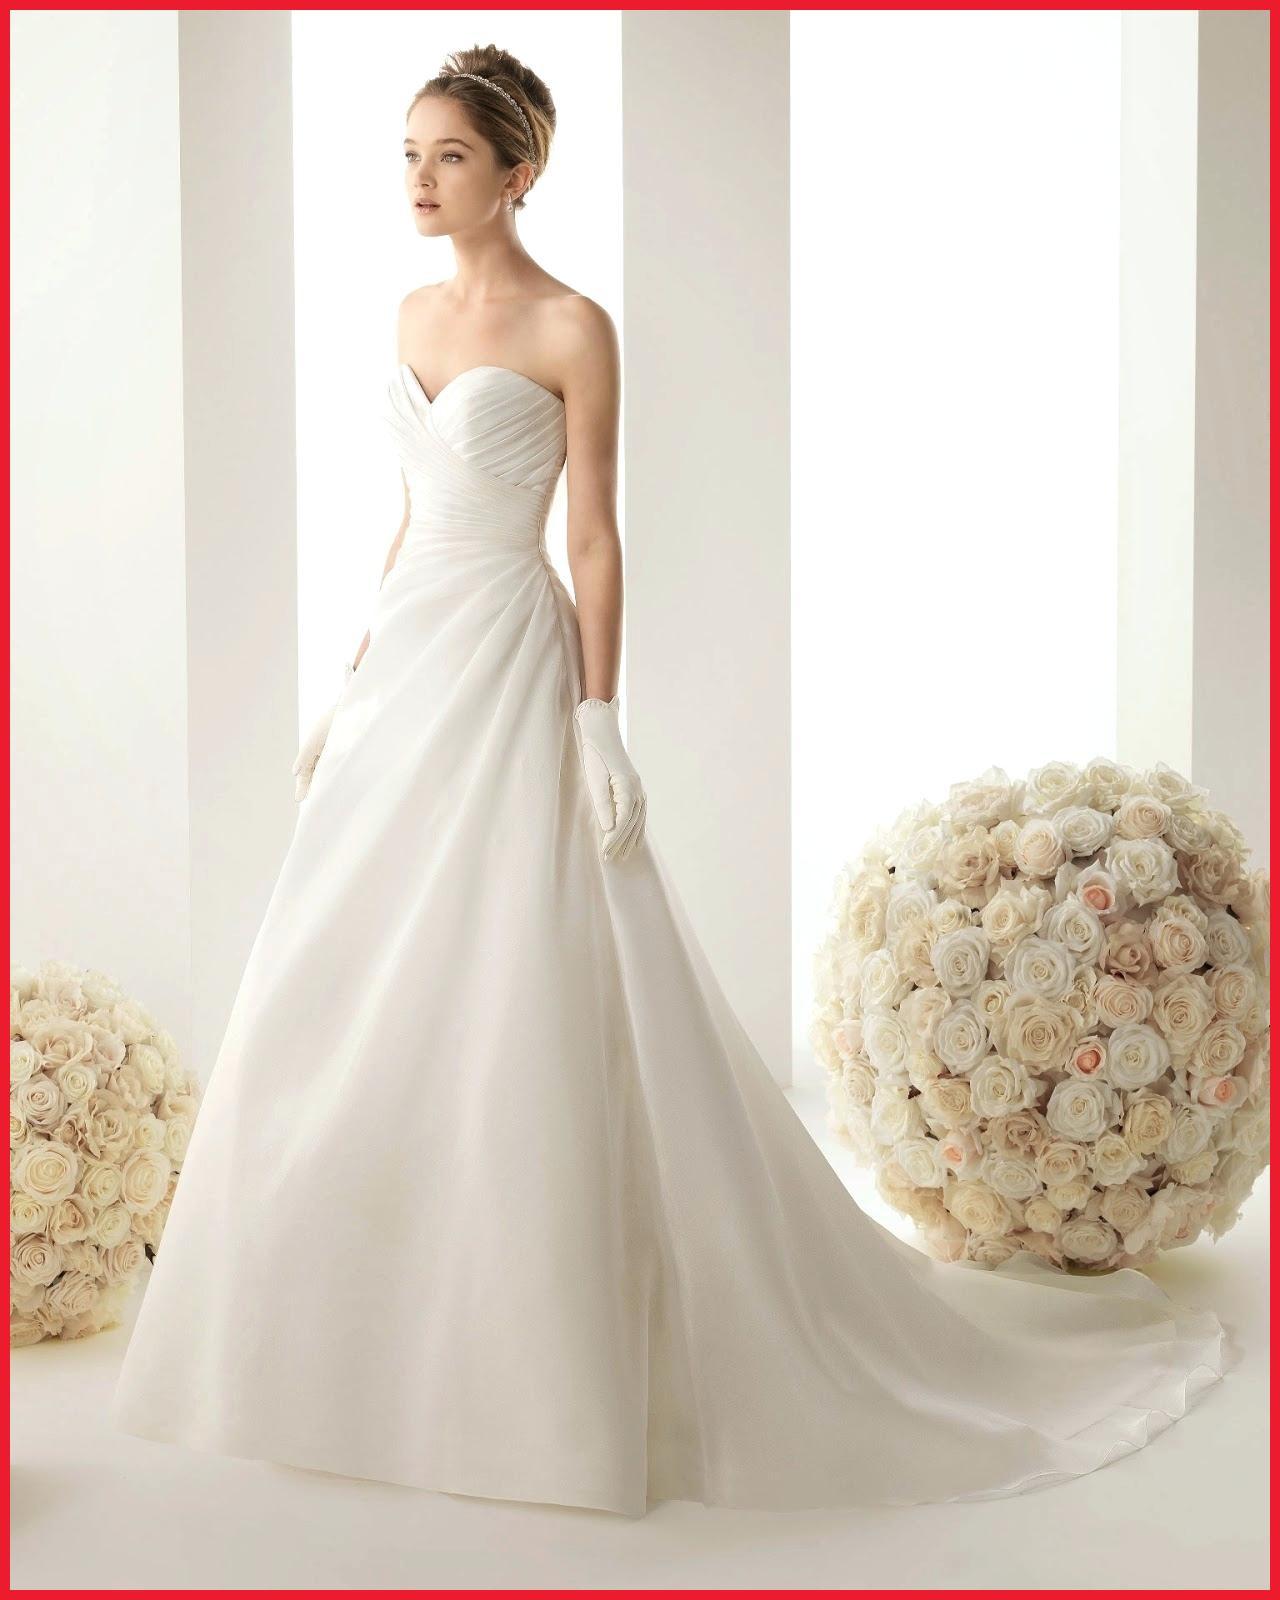 Wedding Gowns Houston Tx: Cheap Wedding Dresses Houston